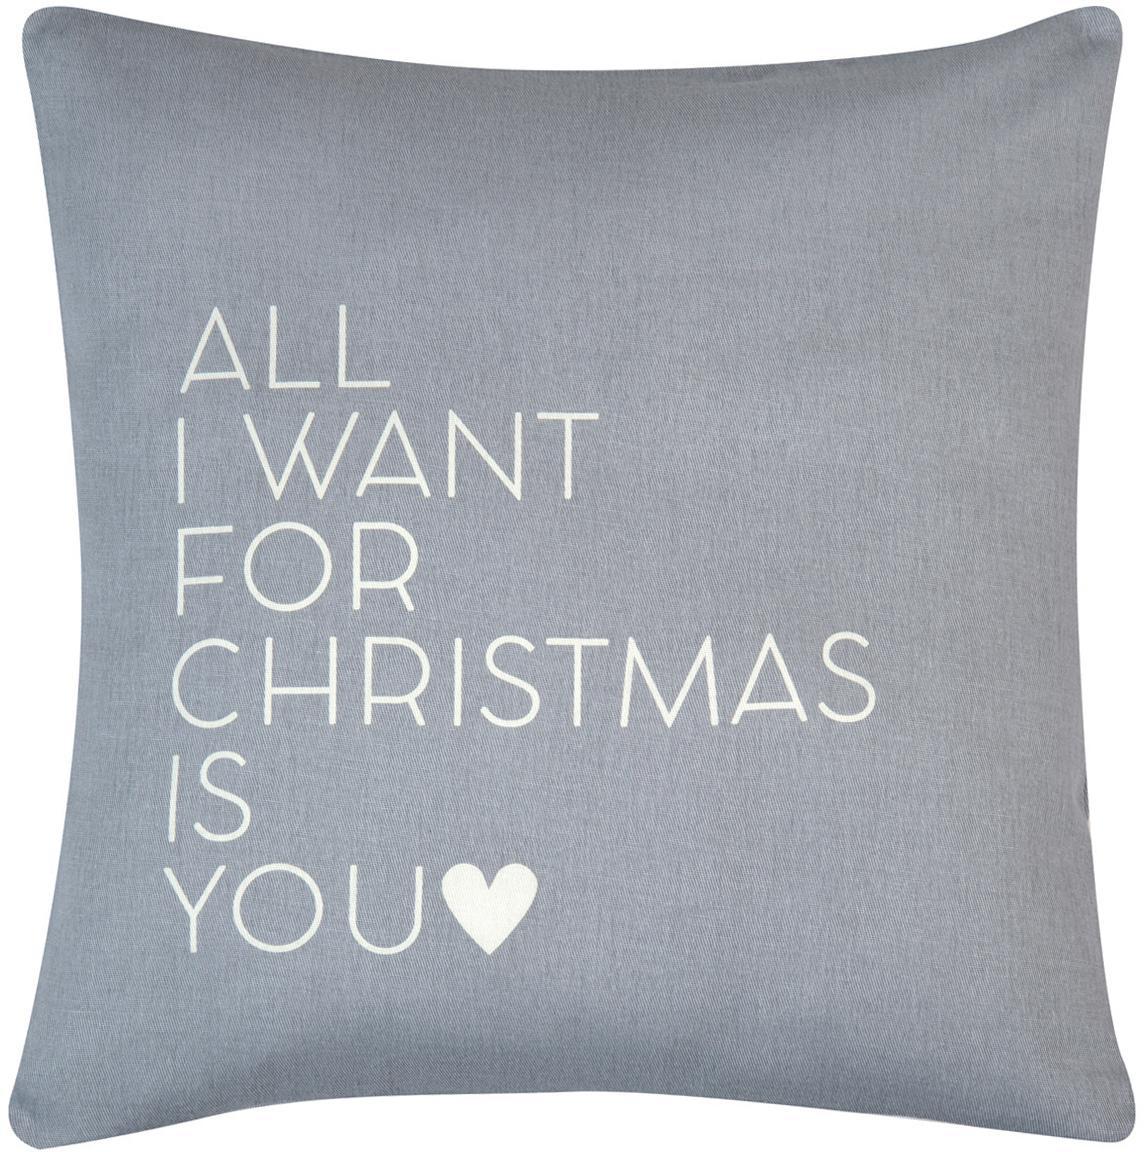 Kissenhülle All I Want mit Schriftzug in Grau/Weiß, Baumwolle, Panamabindung, Grau,Ecru, 40 x 40 cm